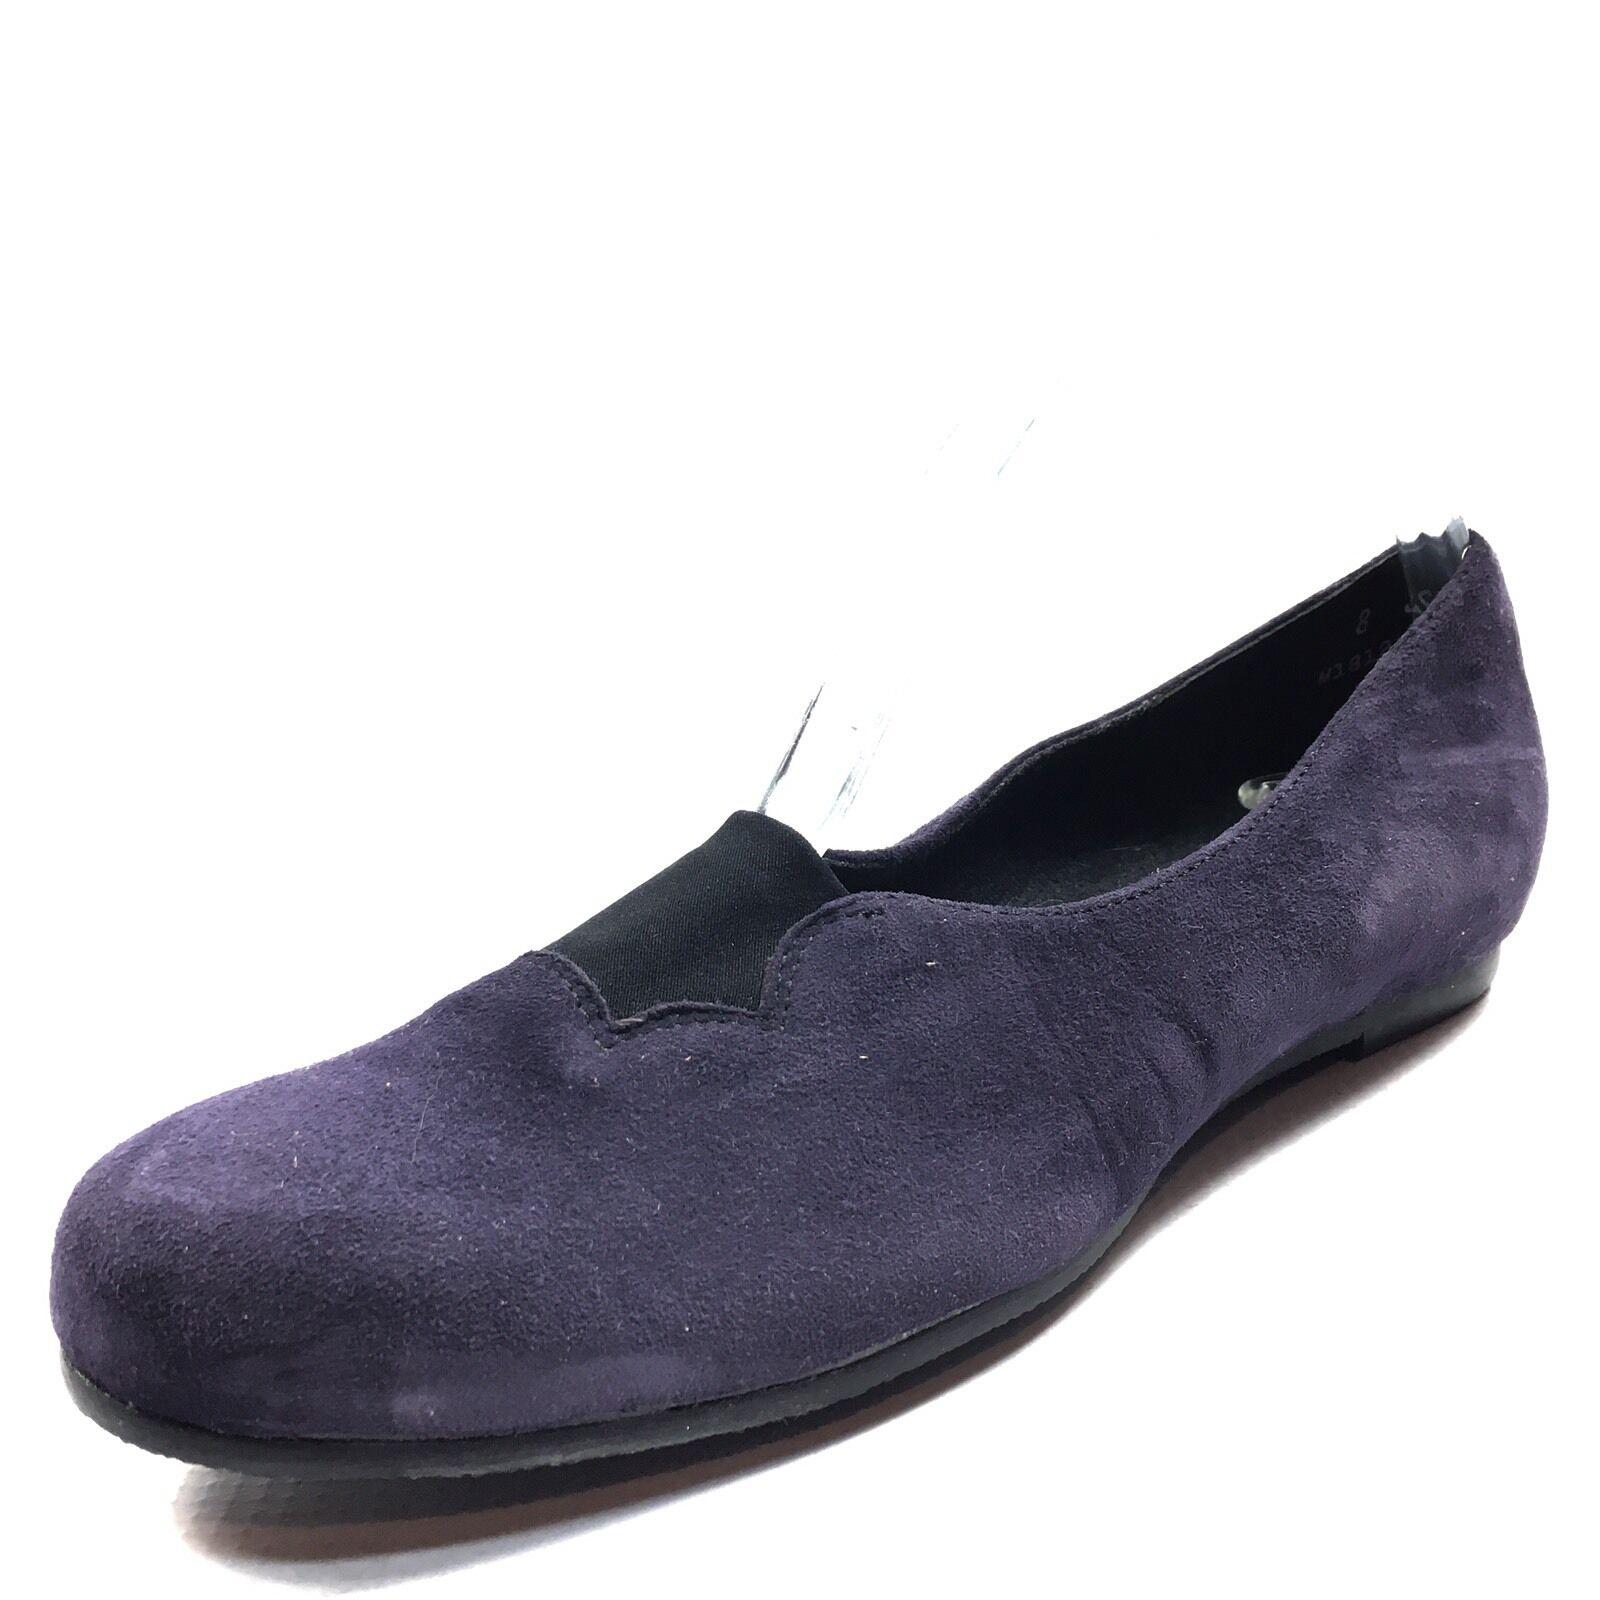 New Munro Women's Purple Suede Luna Flats Ballet Flats Luna Size 8 SS* 6a4983